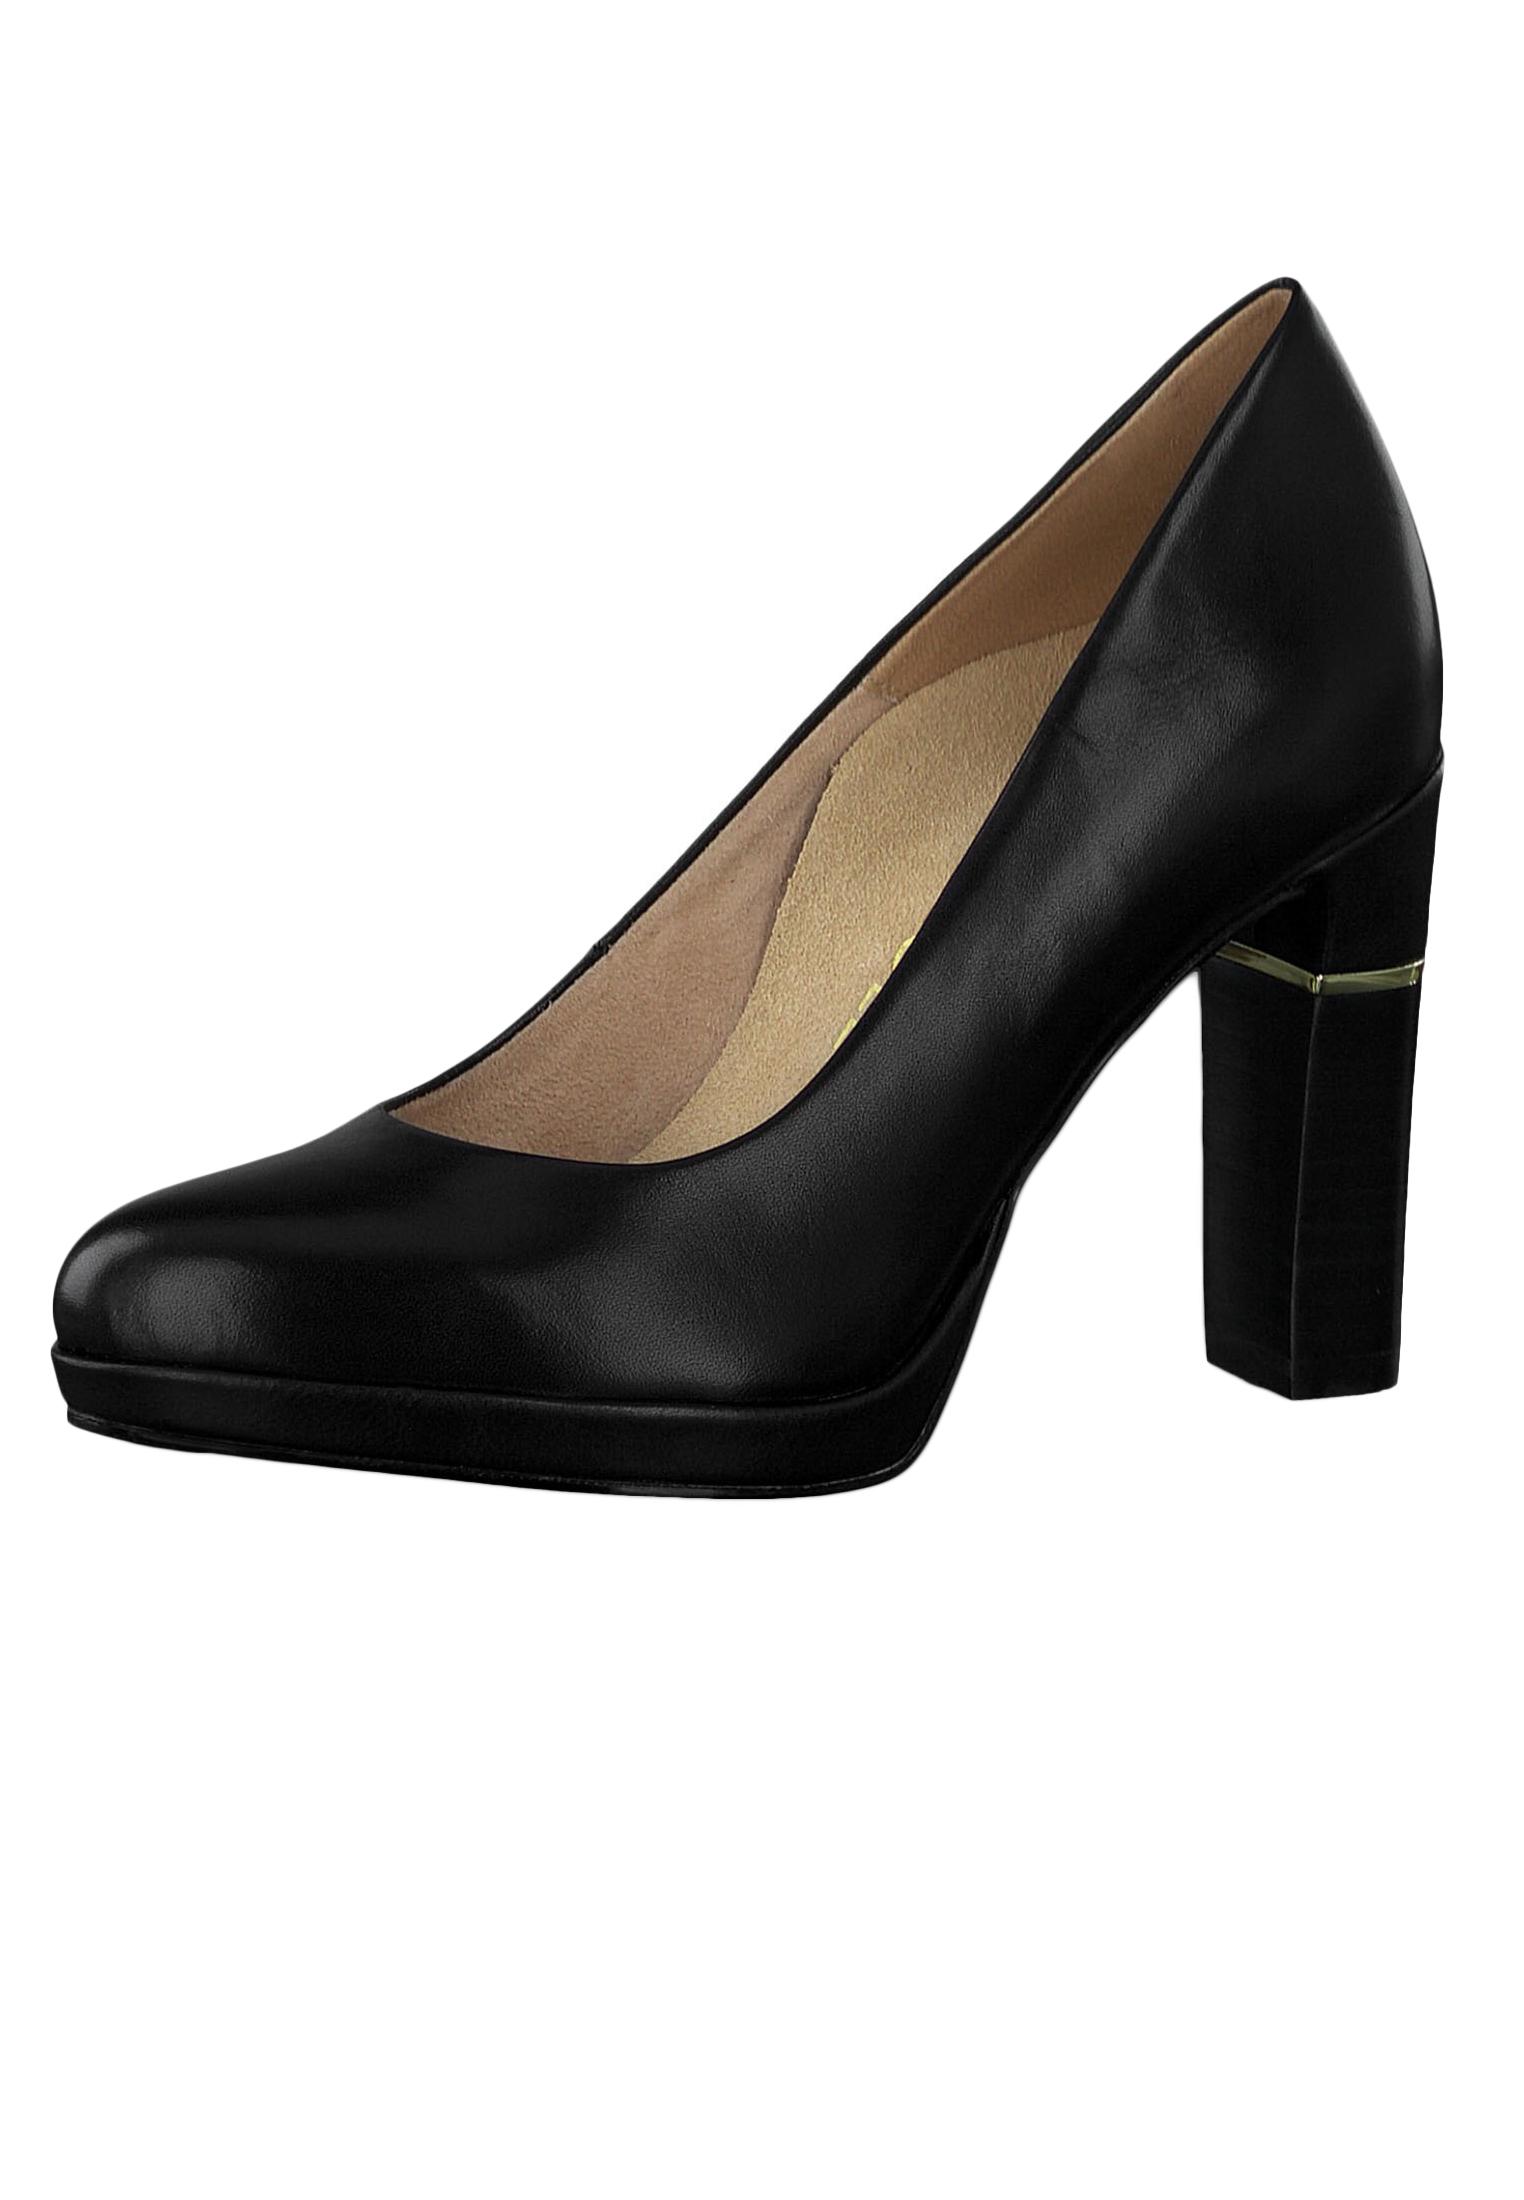 Tamaris 1 22402 23 001 Damen Plateau Pumps High Heel Leder Black Schwarz Anti Slide Anti Shokk